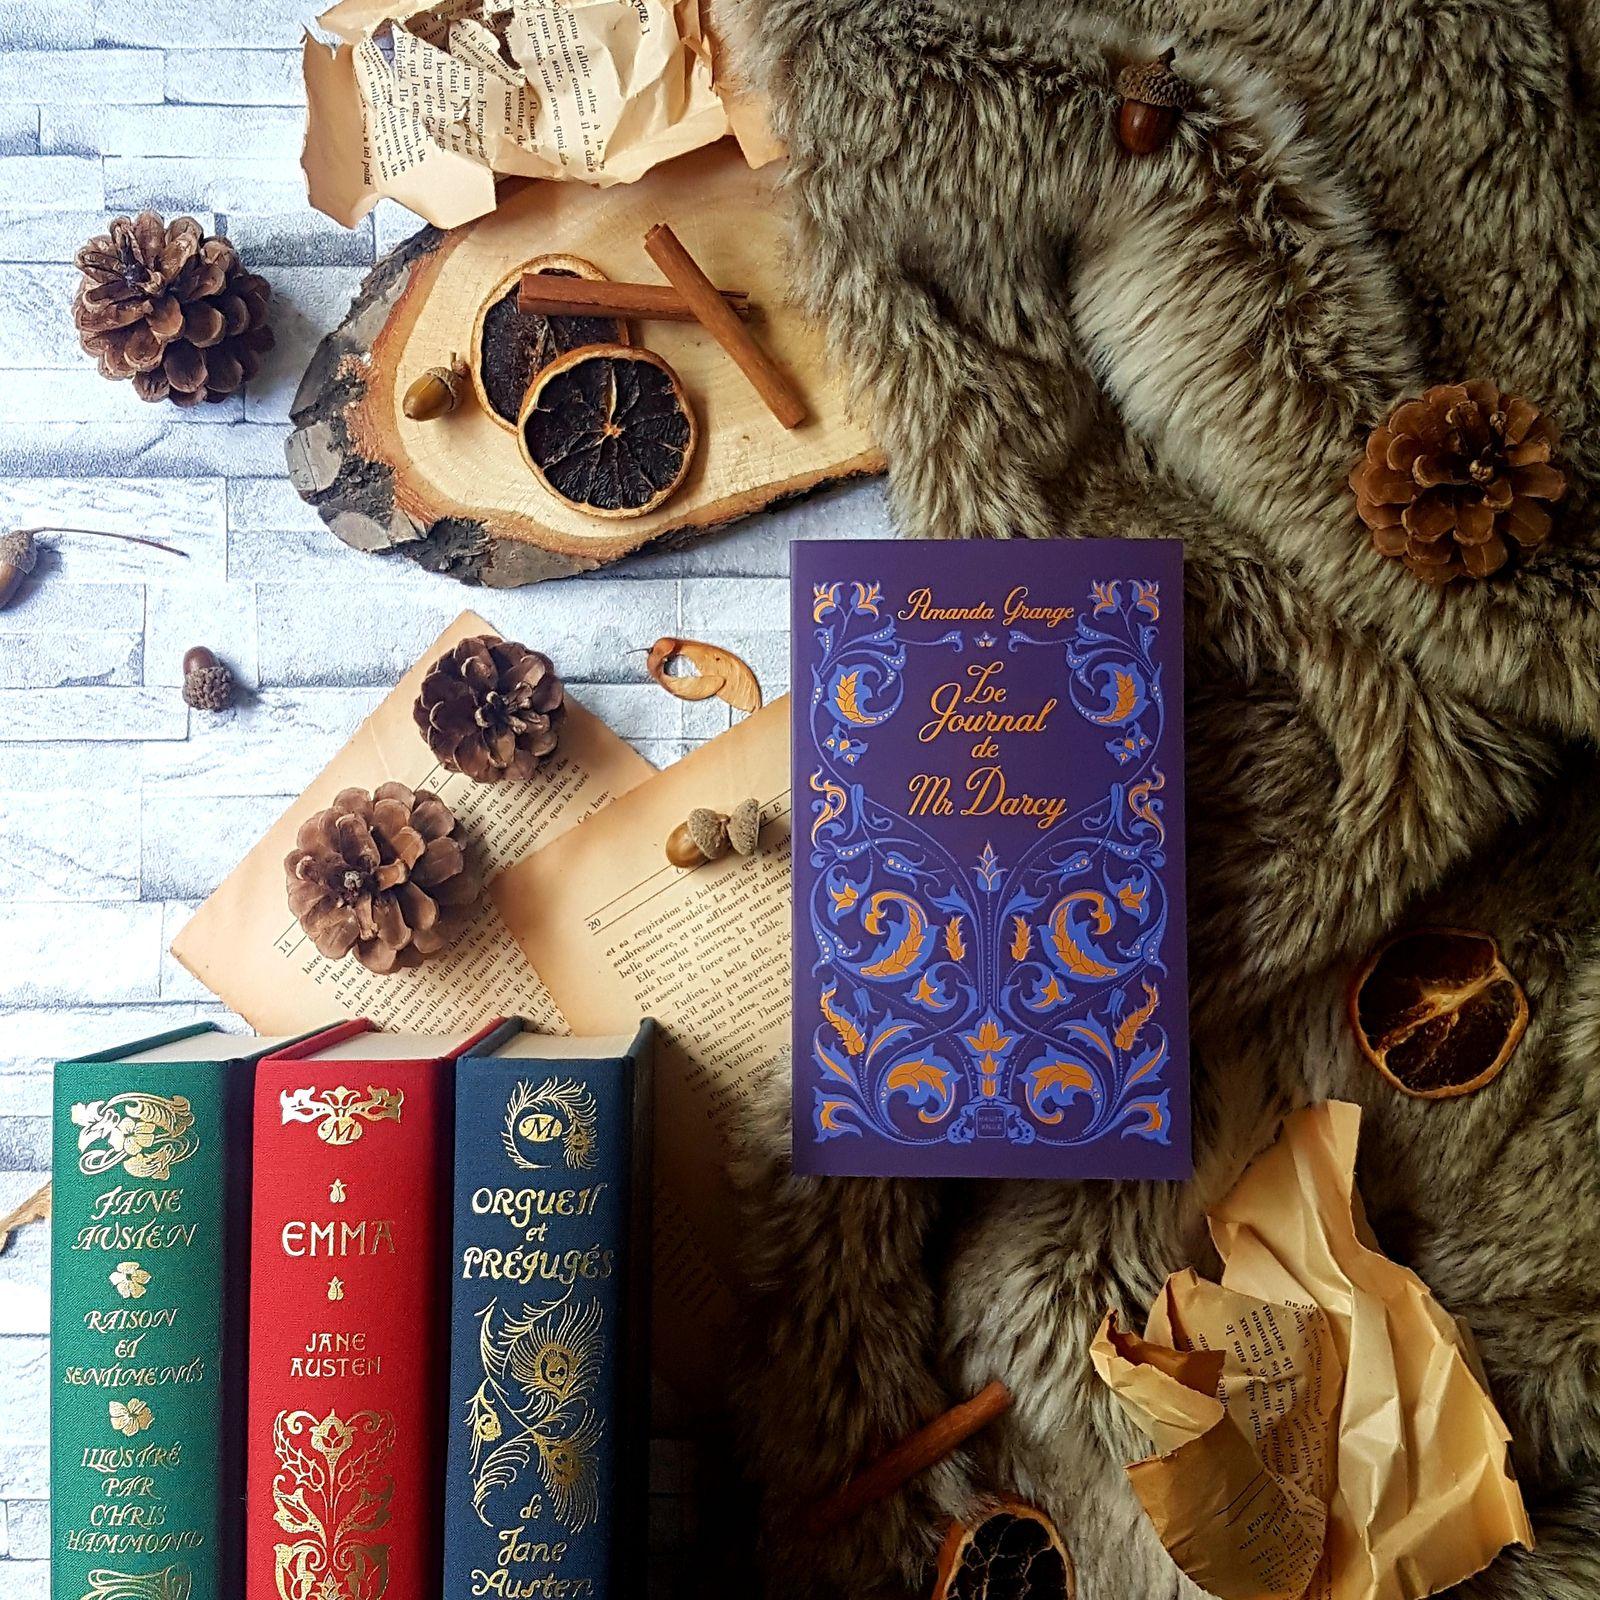 Le Journal de Mr Darcy - Amanda Grange